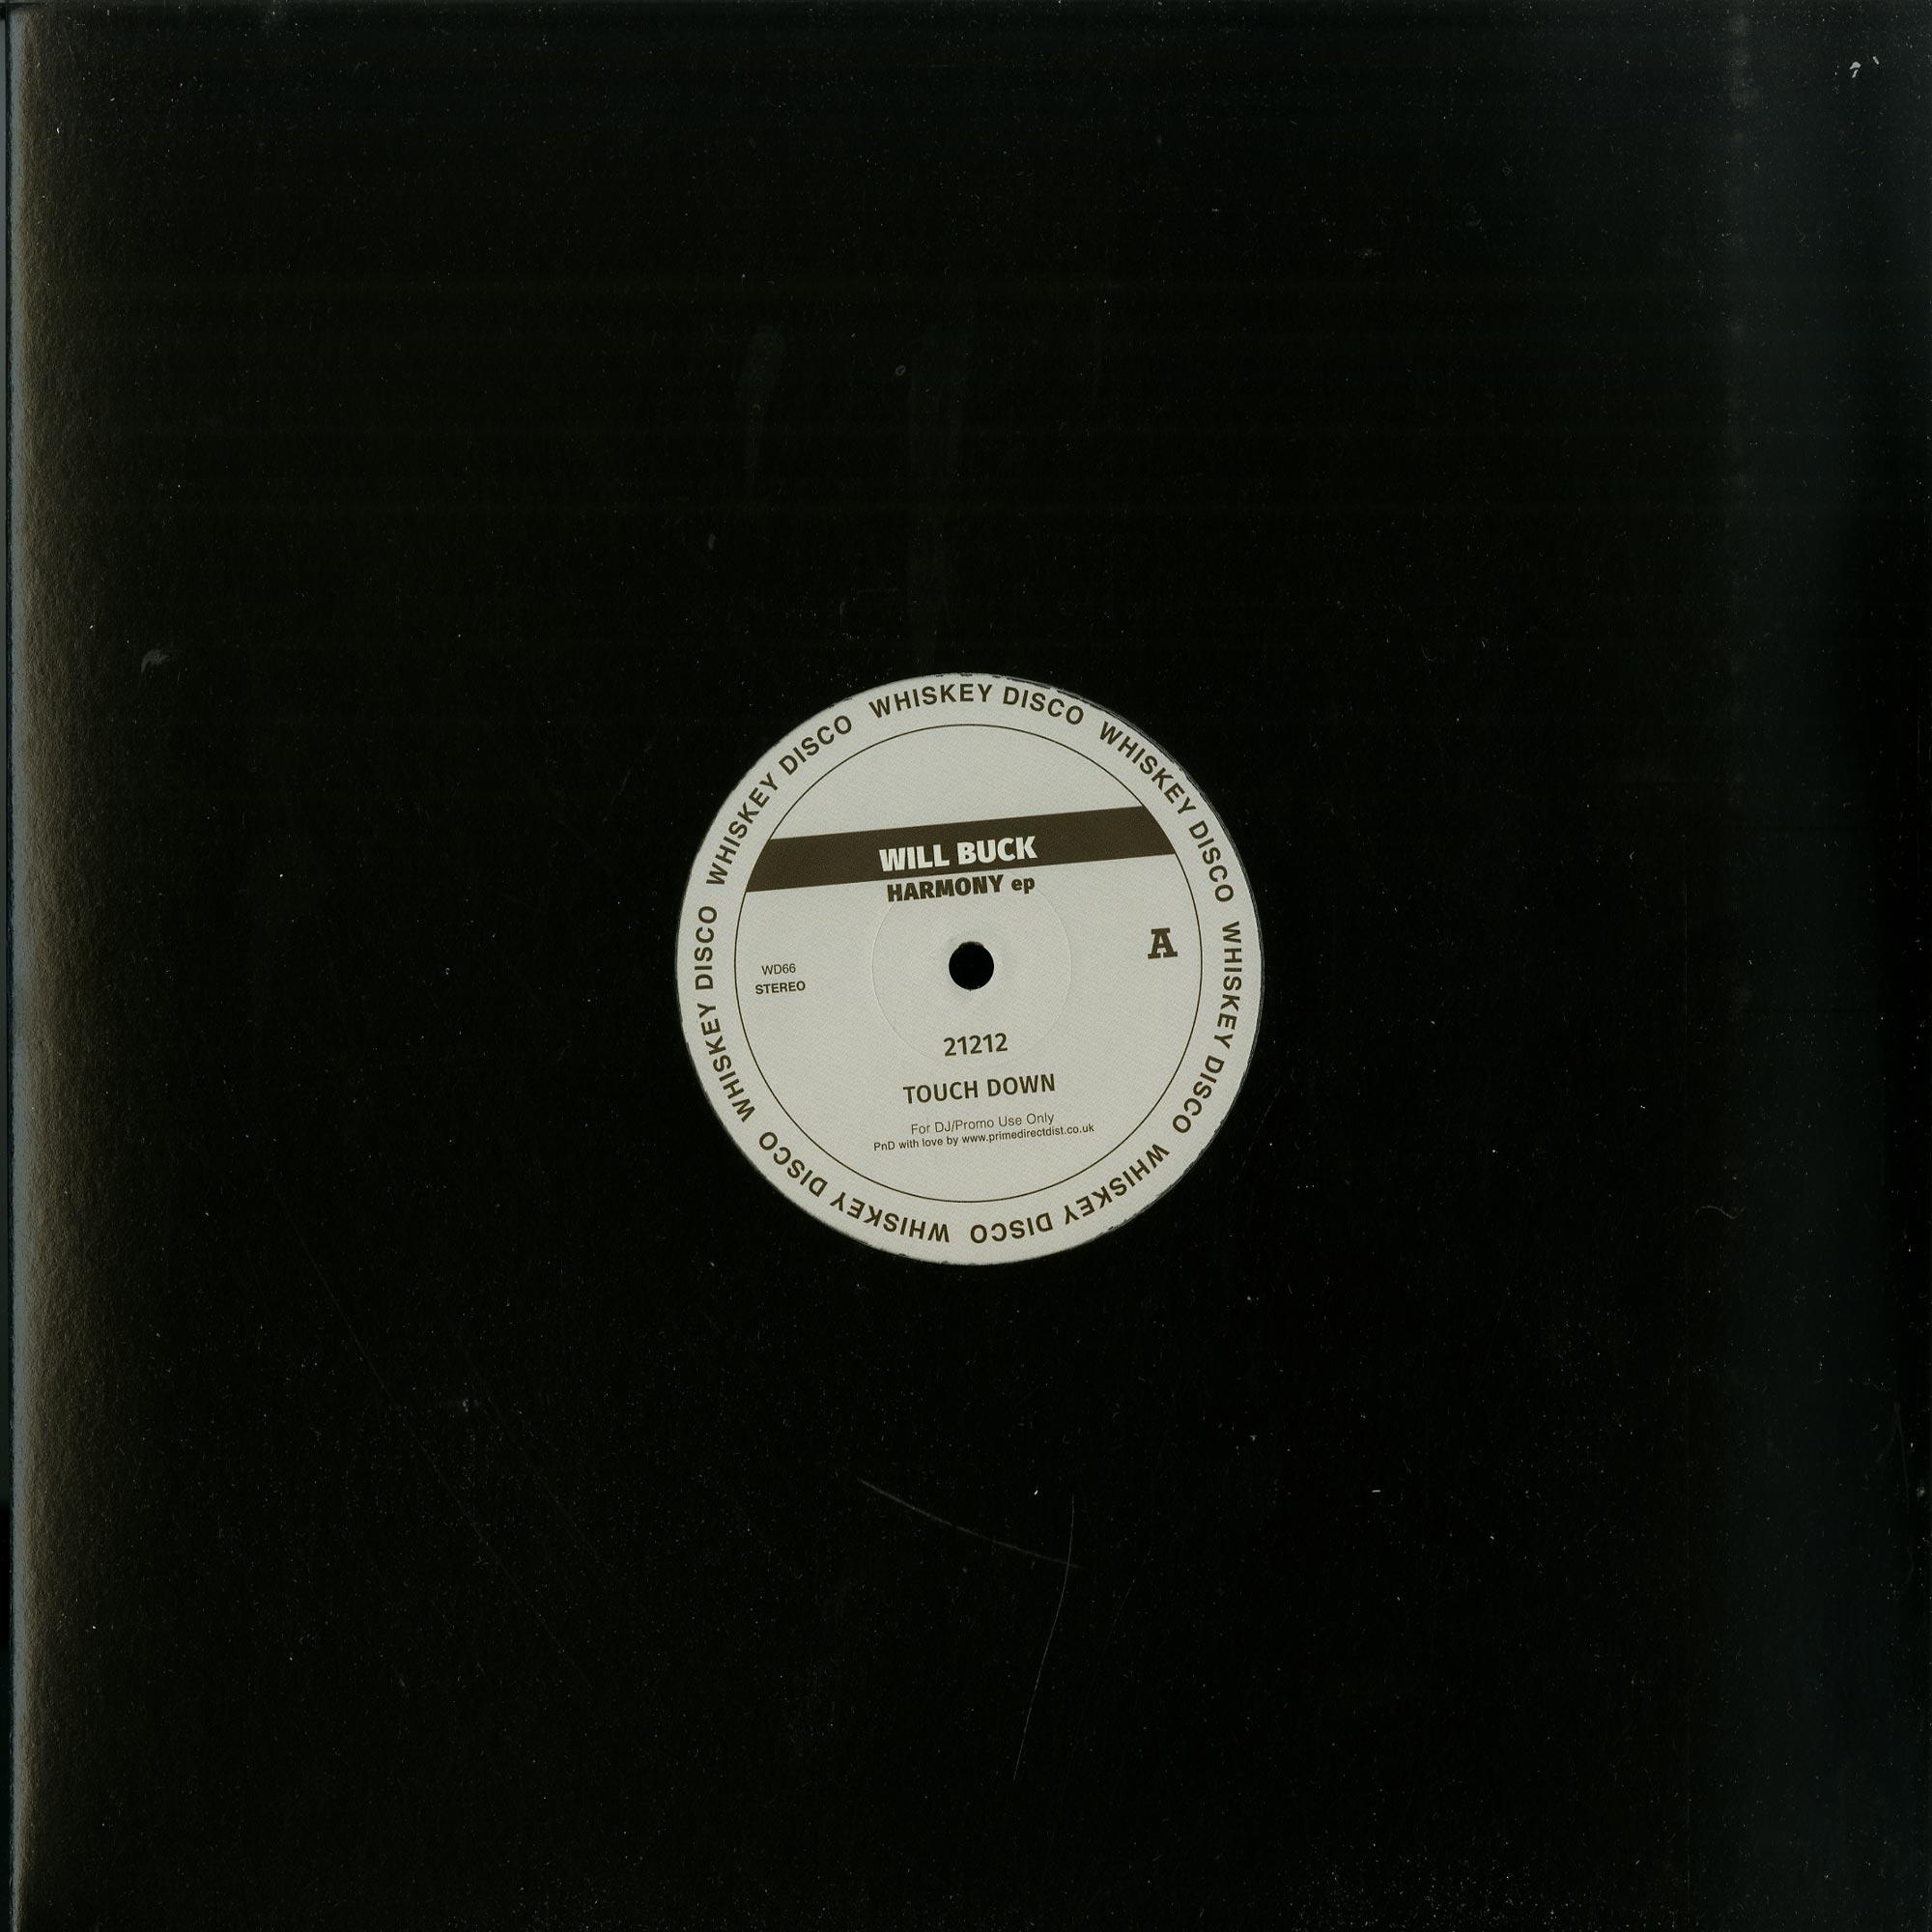 Will Buck - HARMONY EP